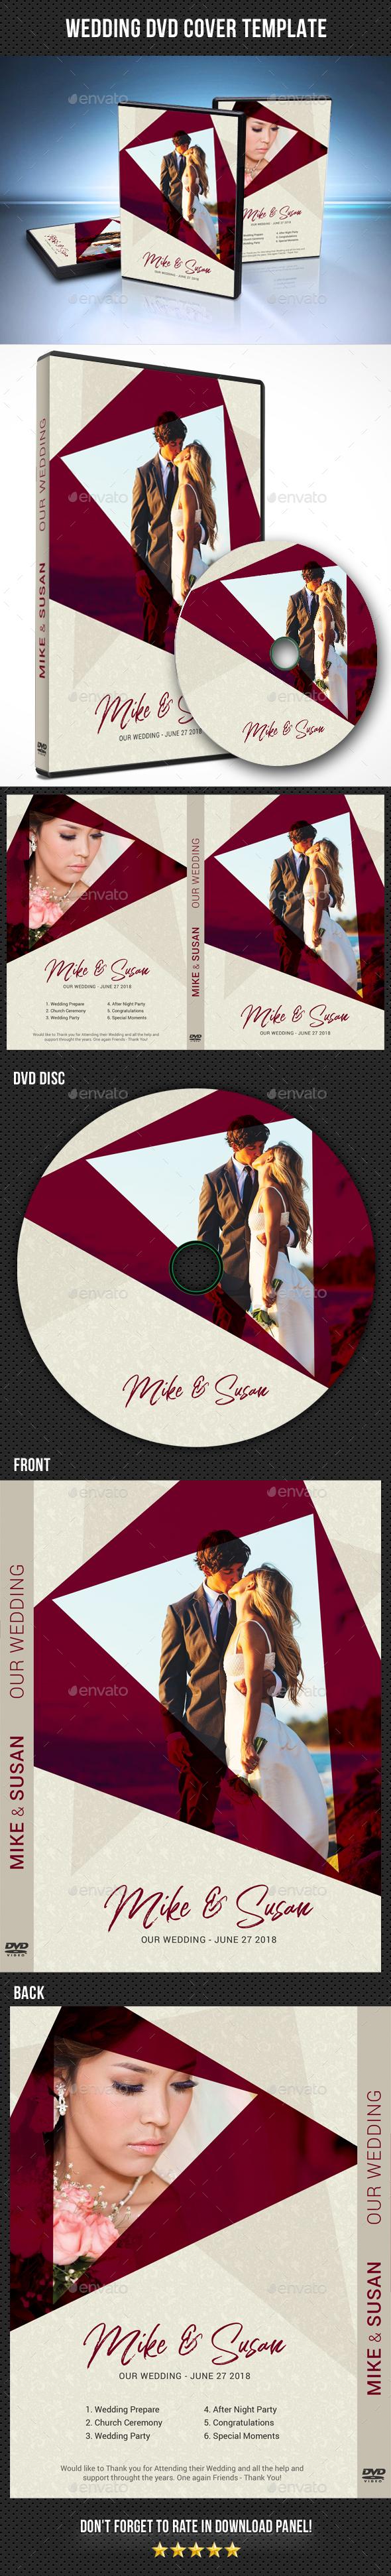 Wedding DVD Cover Template 24 - CD & DVD Artwork Print Templates